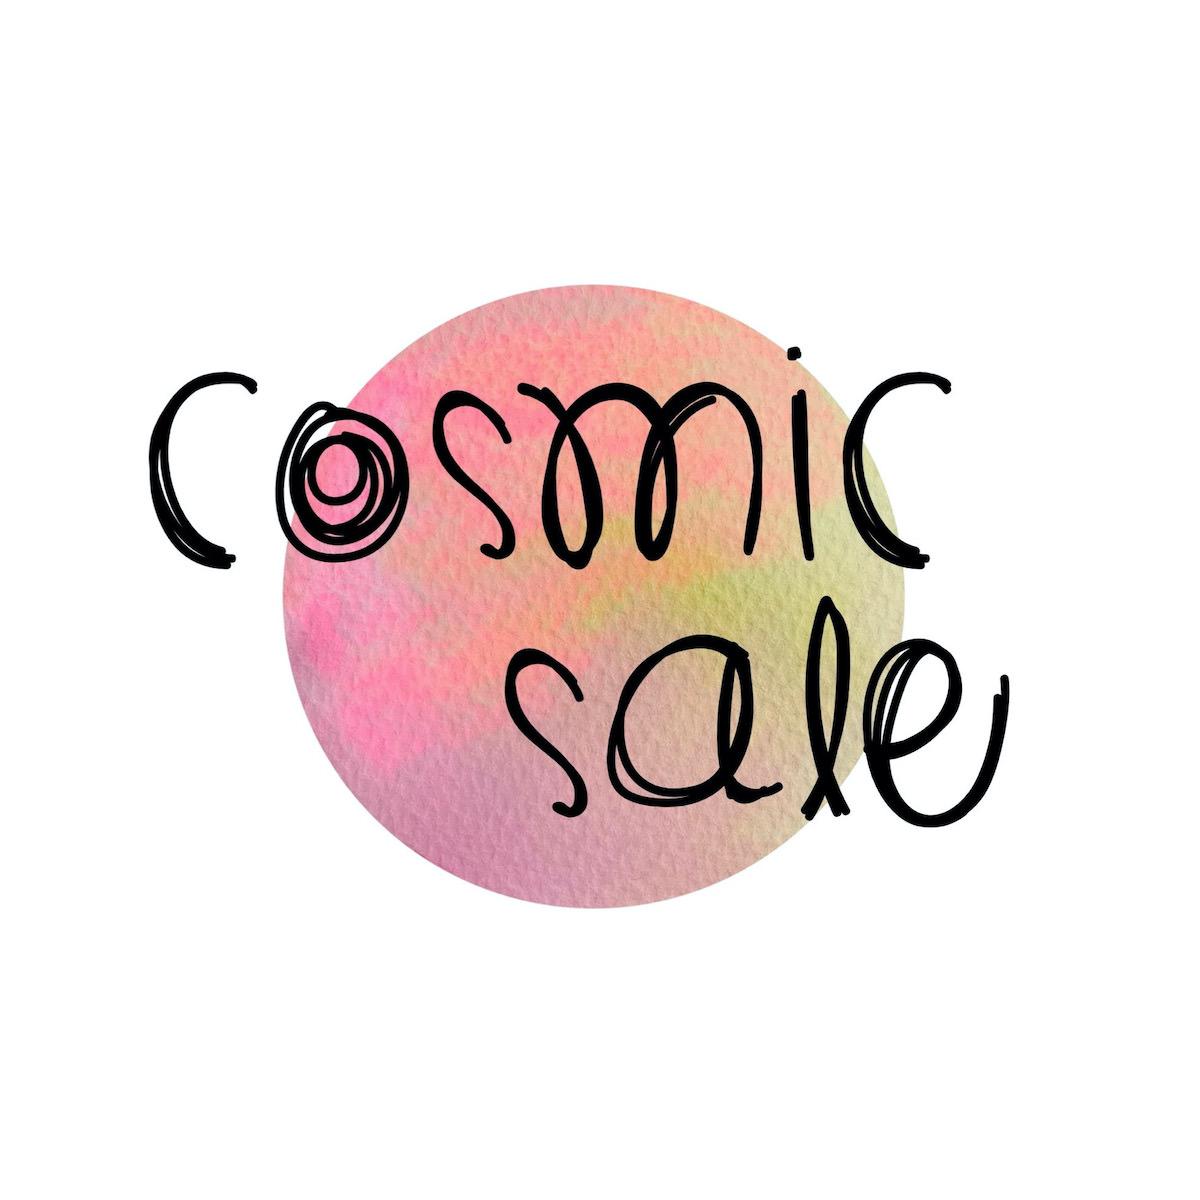 Cosmic Sale